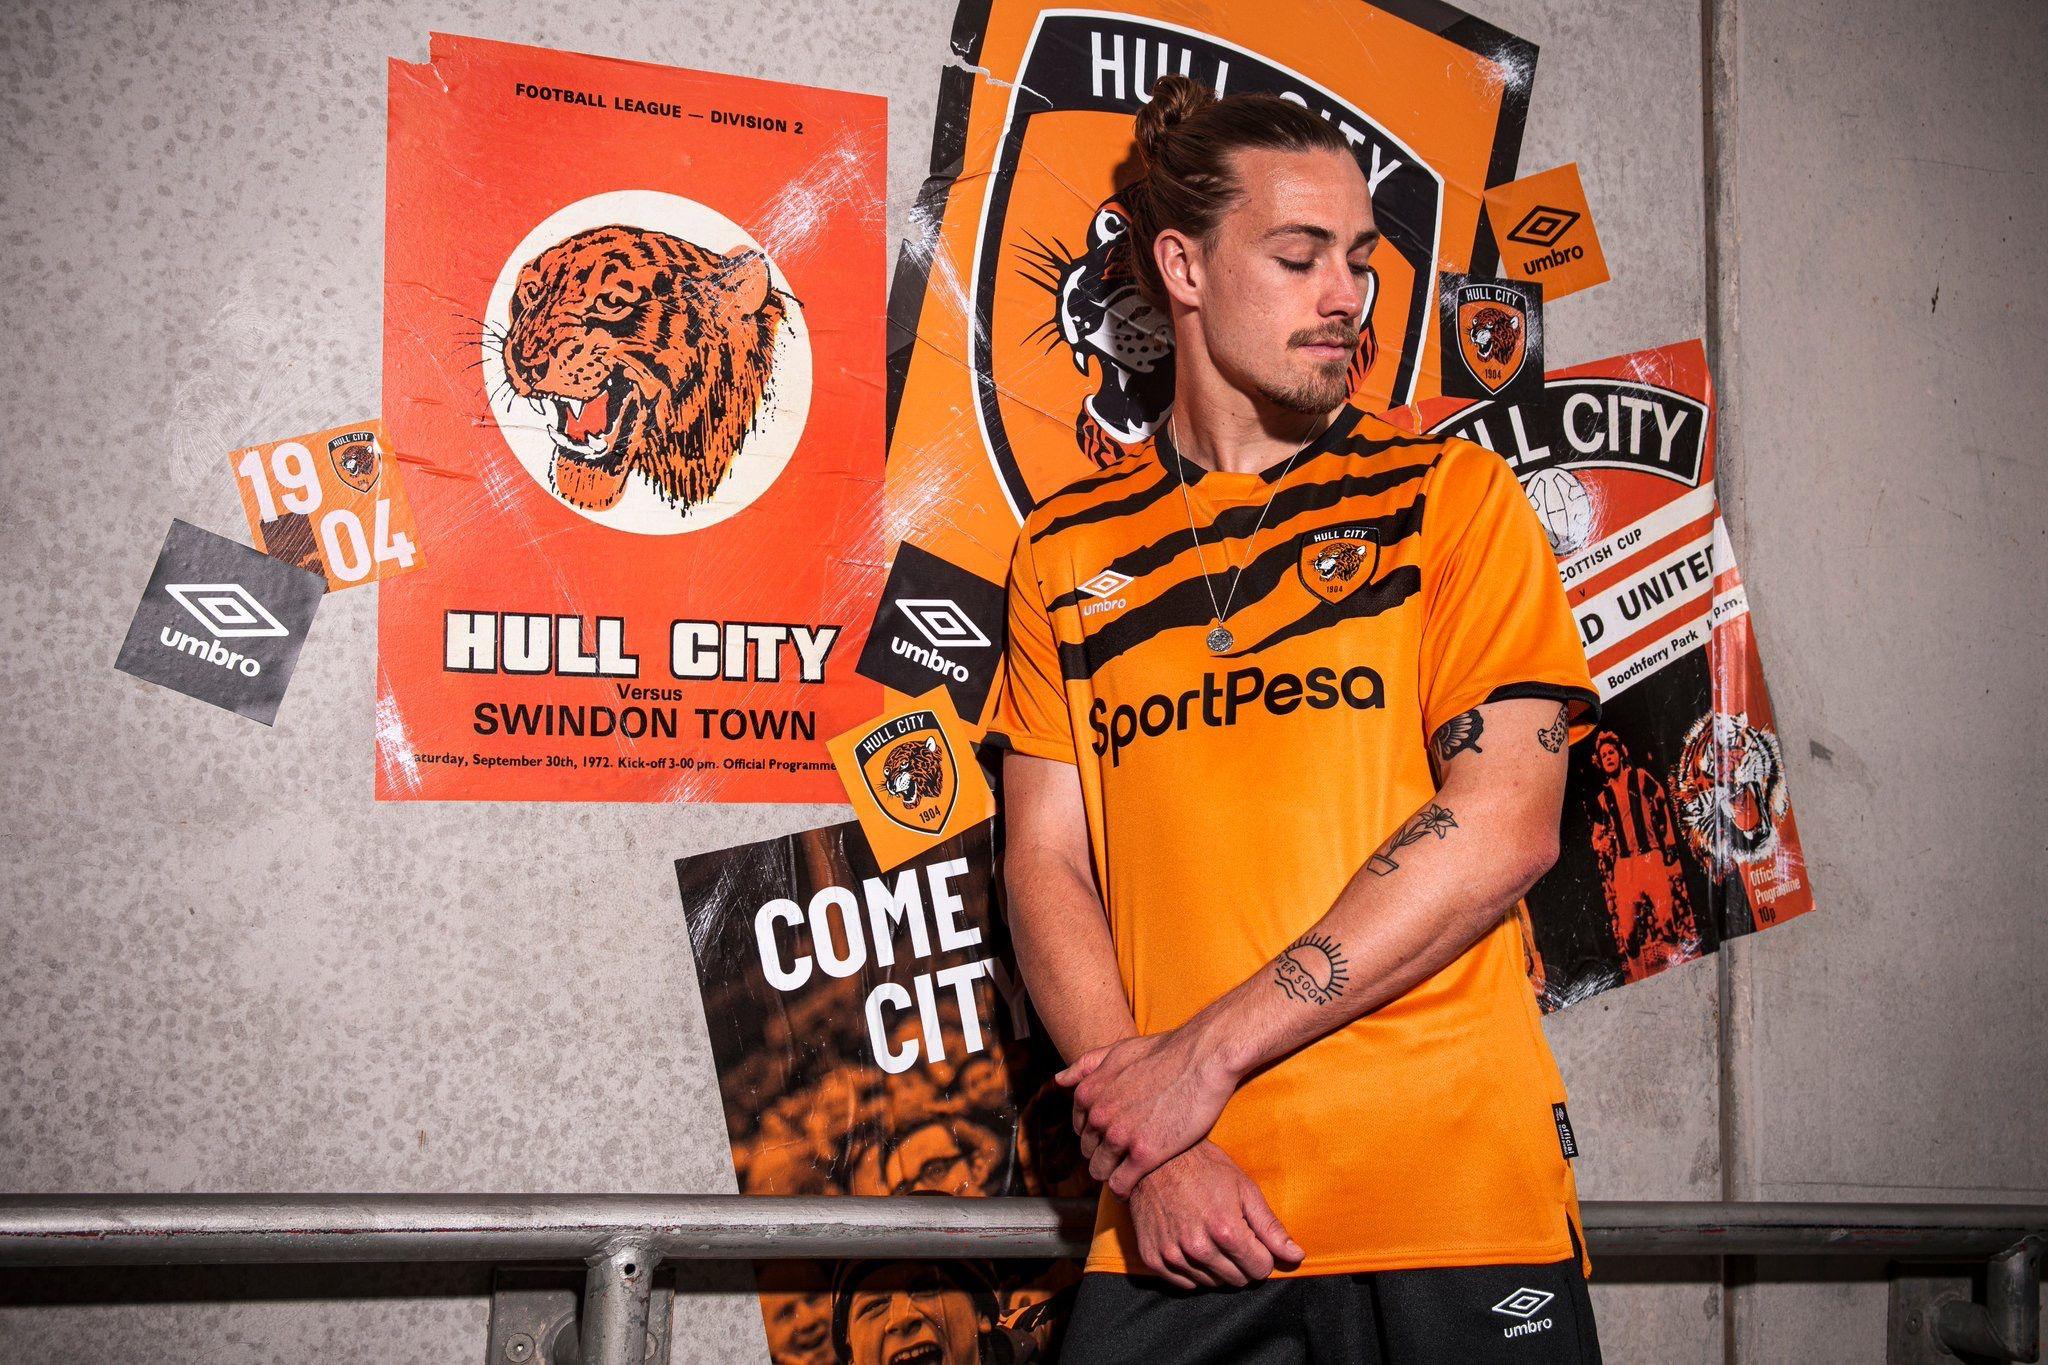 Hull City Afc 2019 2020 Home Kit Hull City Hull City